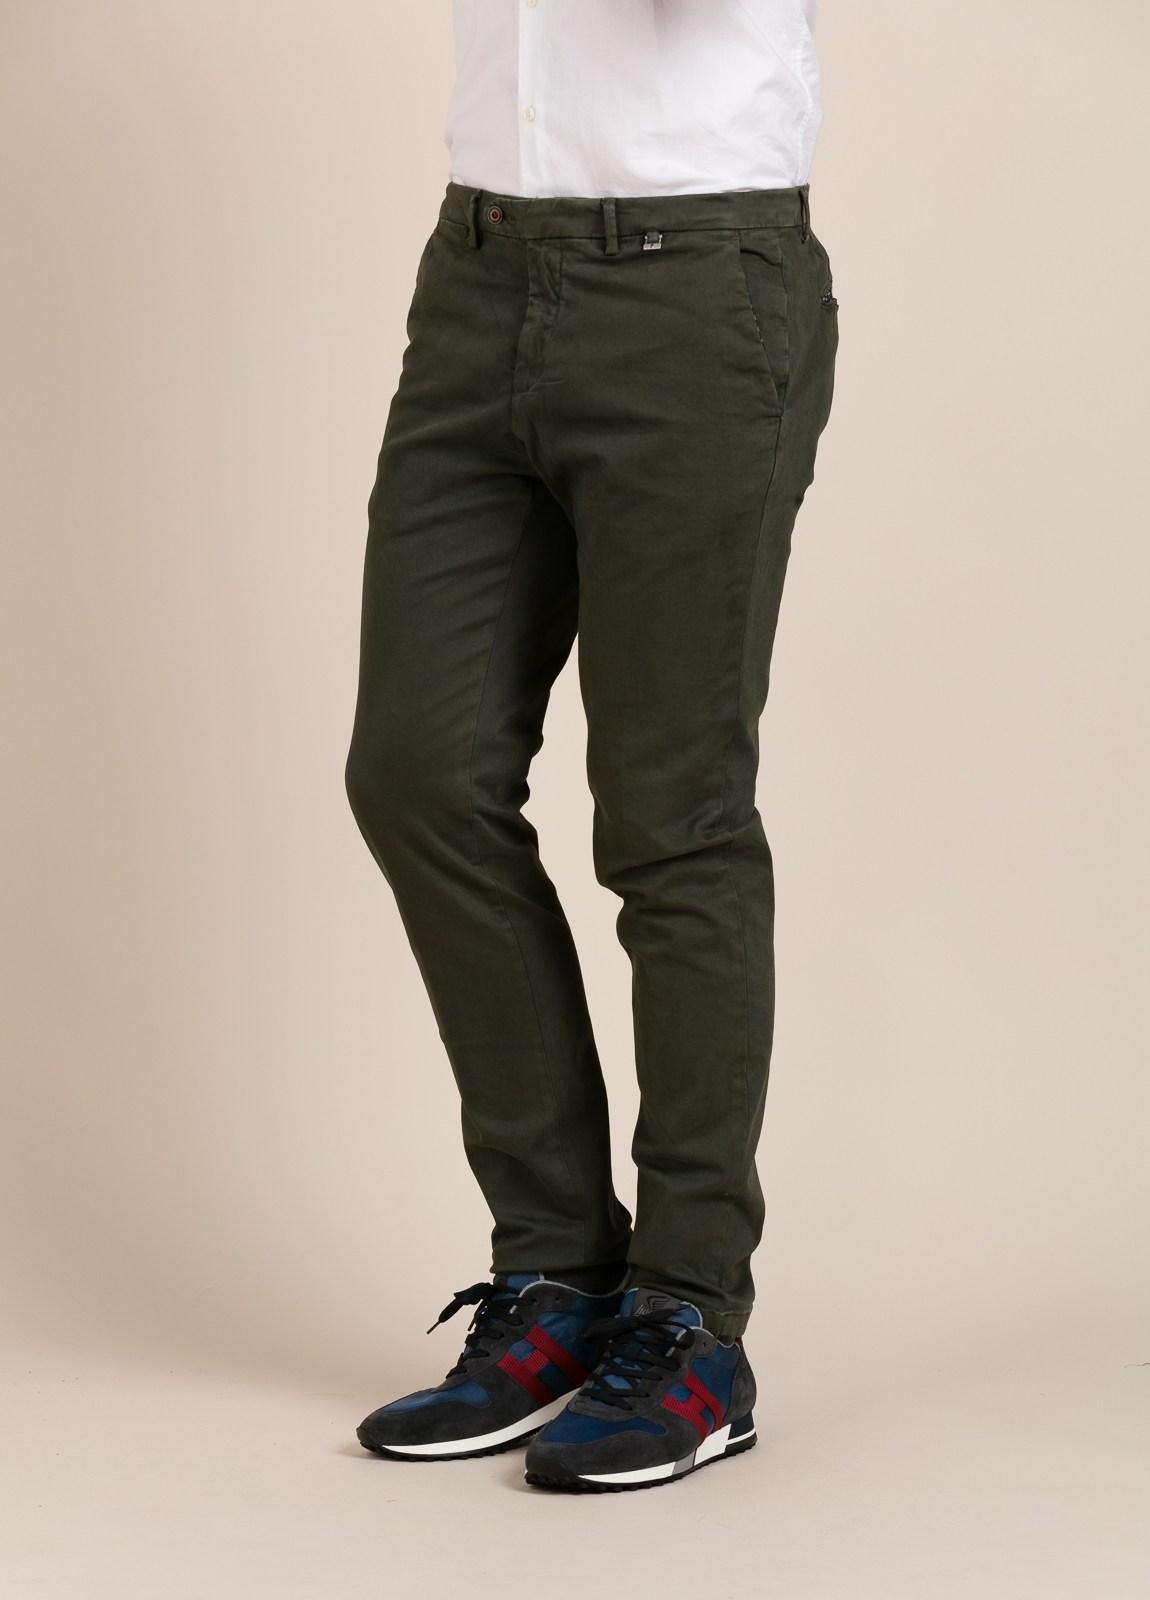 Pantalón chino PAOLONI verde kaki. - Ítem1